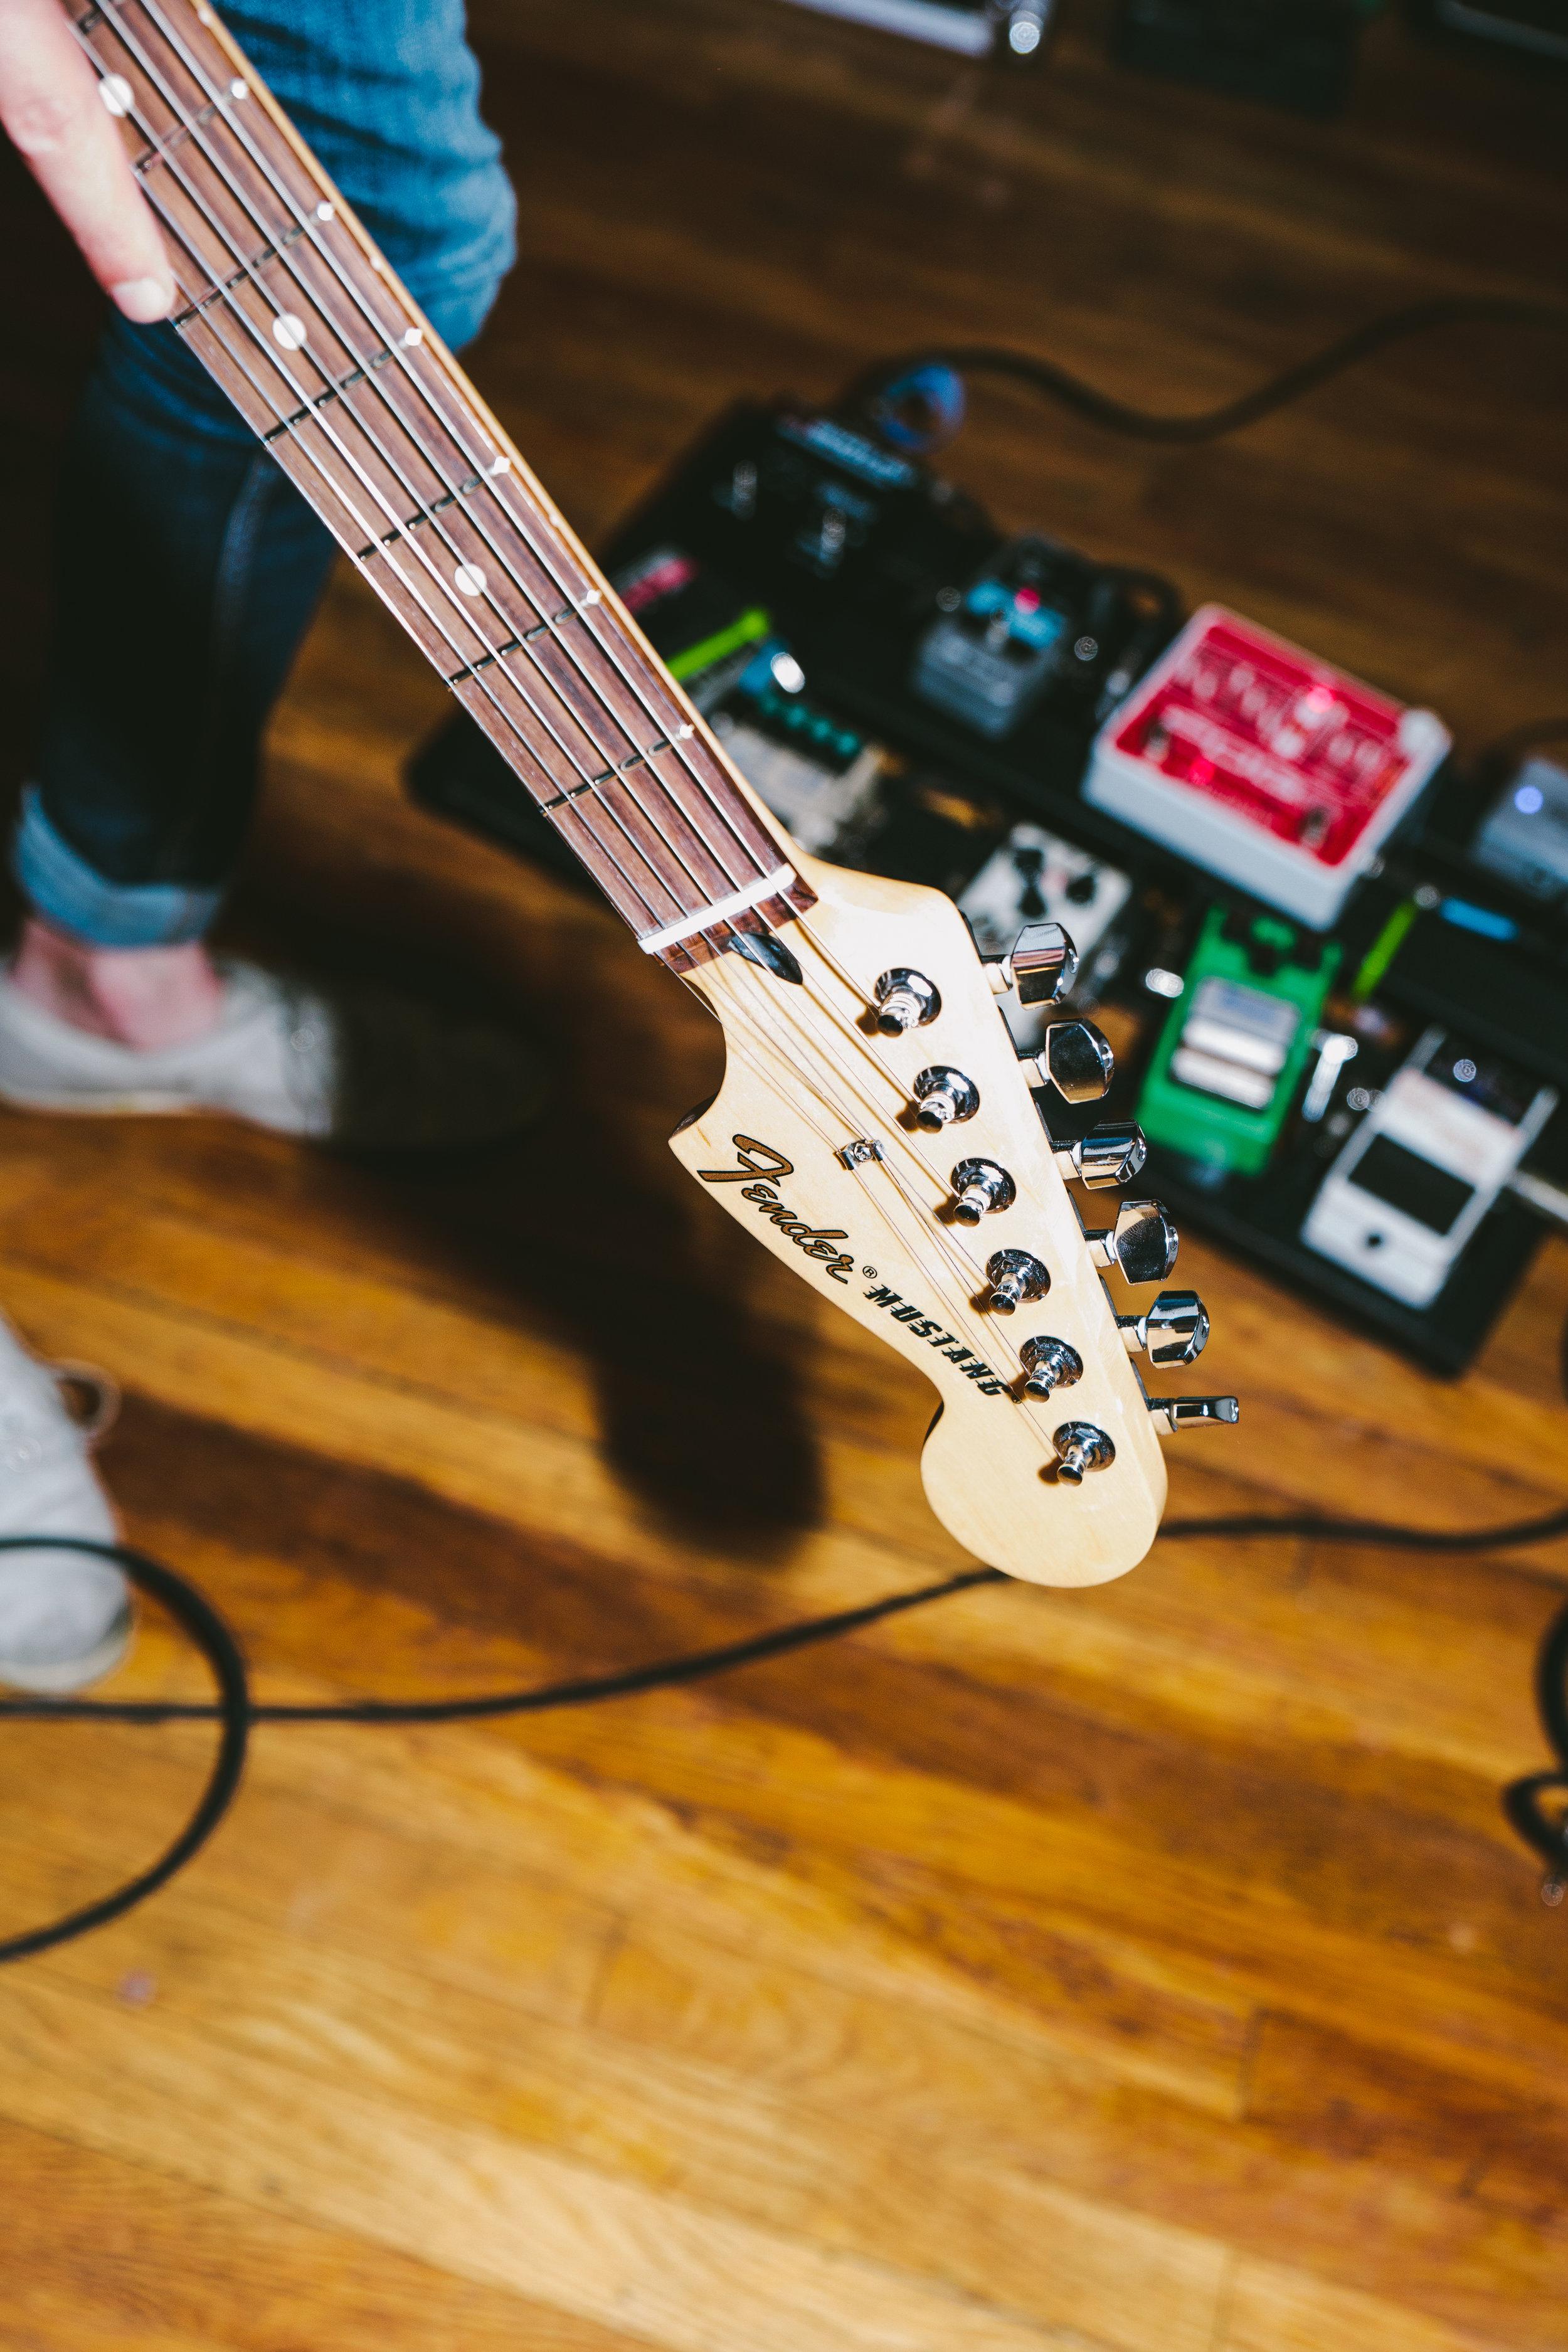 Fender-Offsets-Juarez-8583.jpg